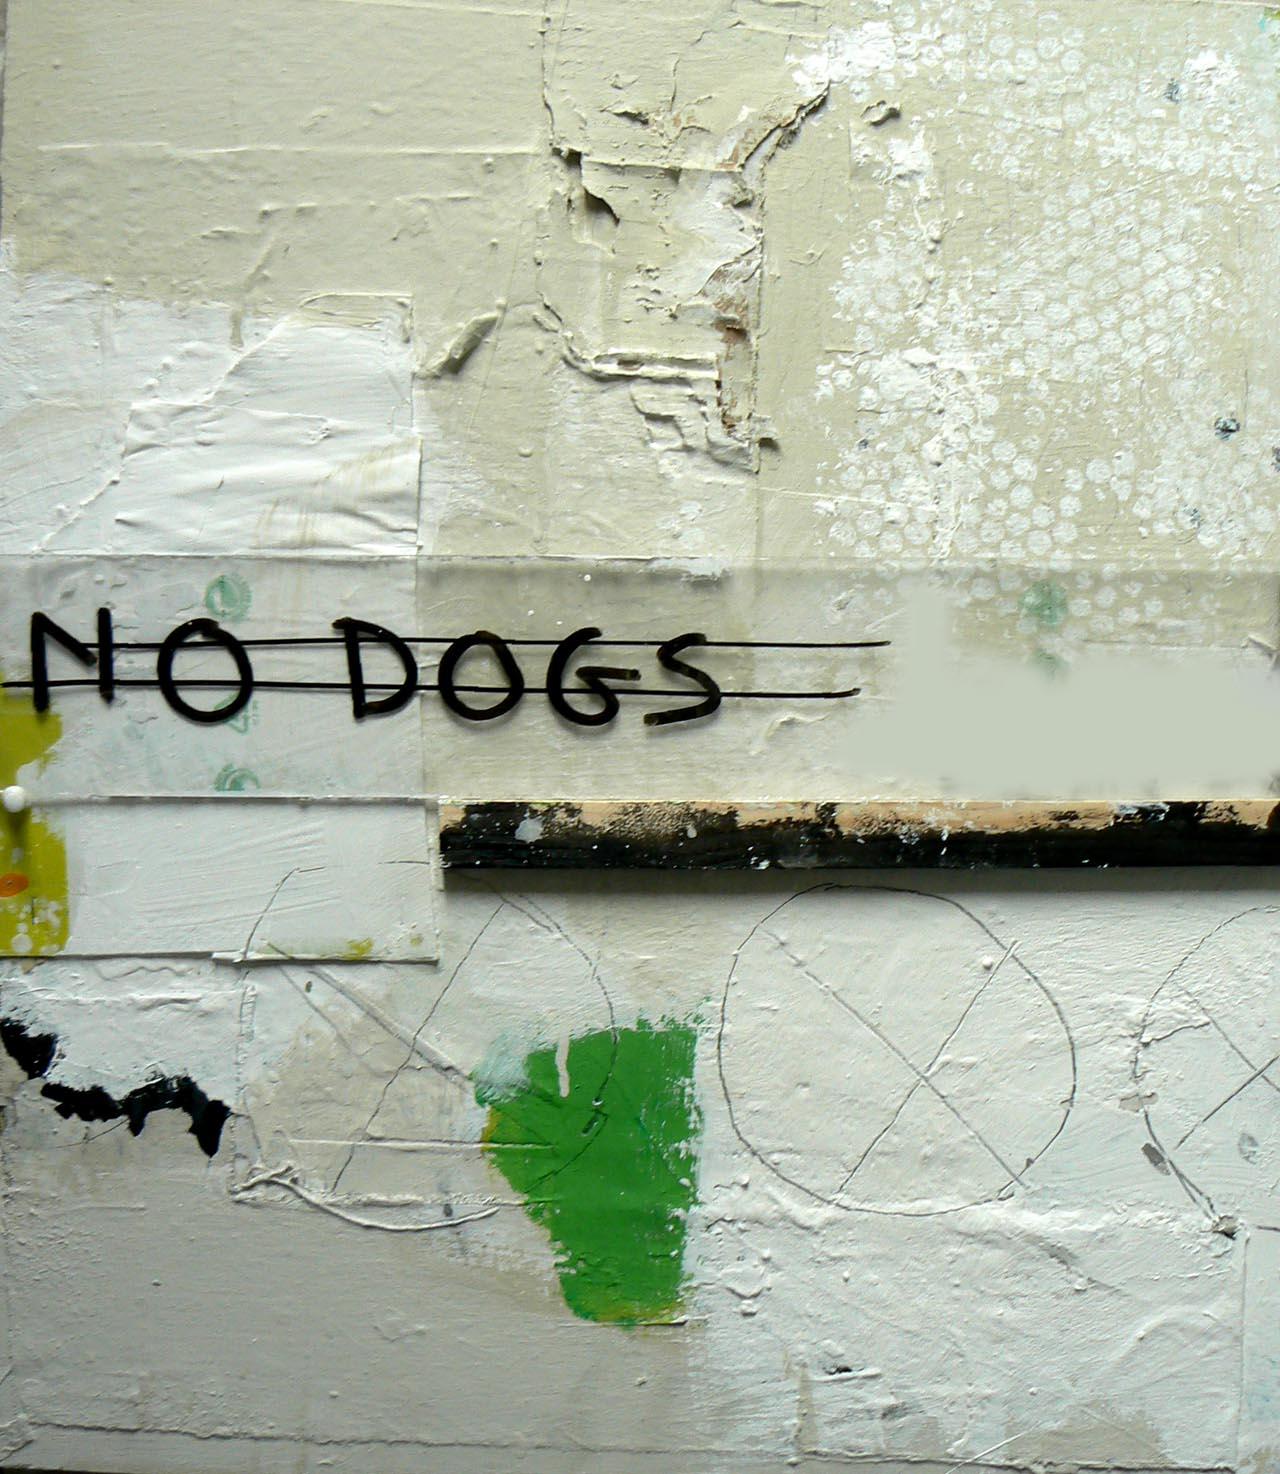 nodogs56